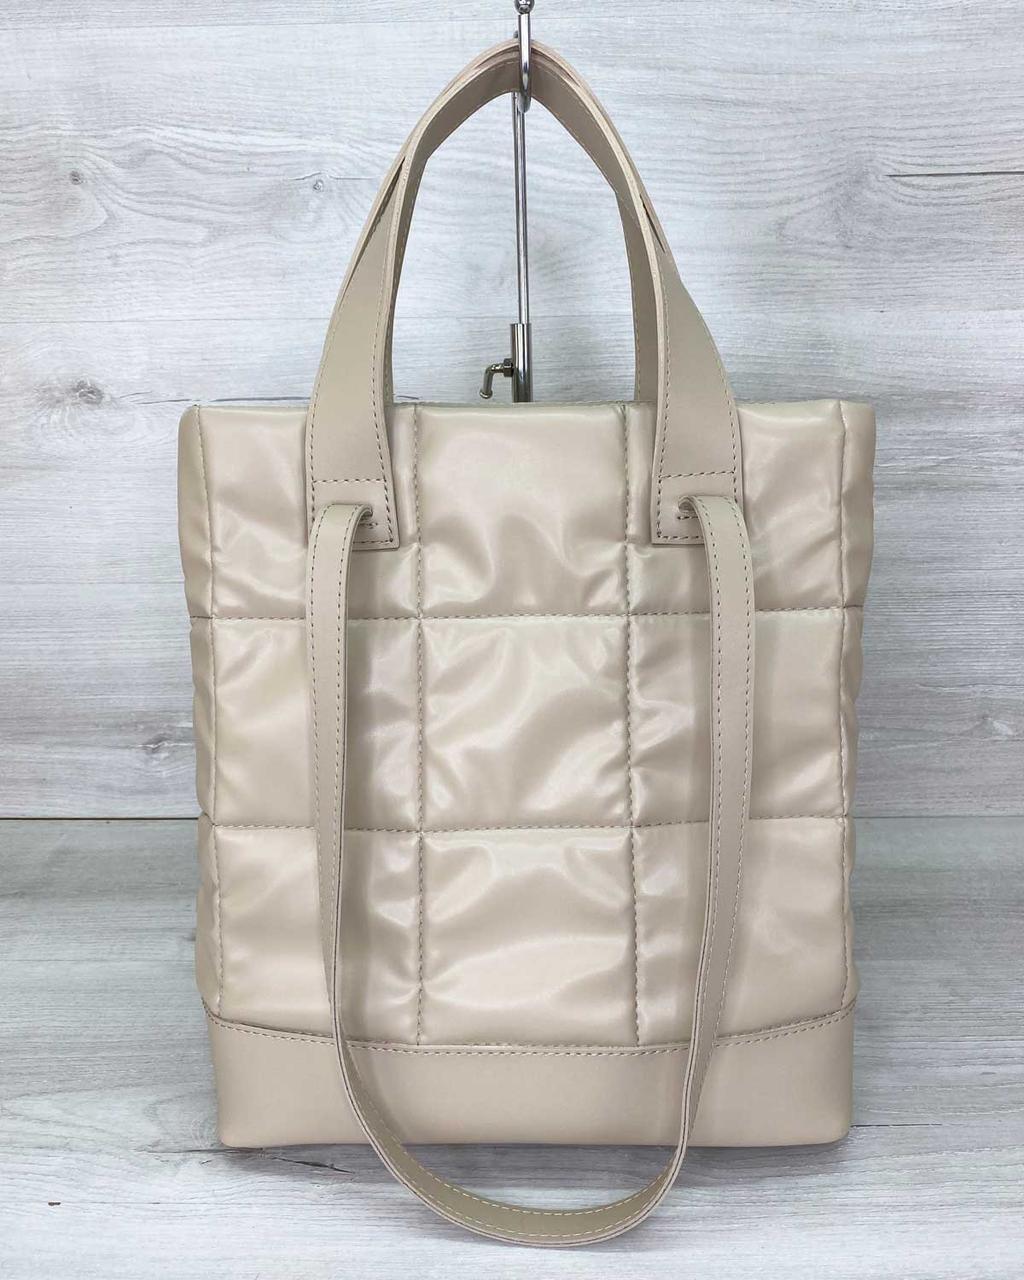 Жіноча сумка «Руки» бежева стьобана